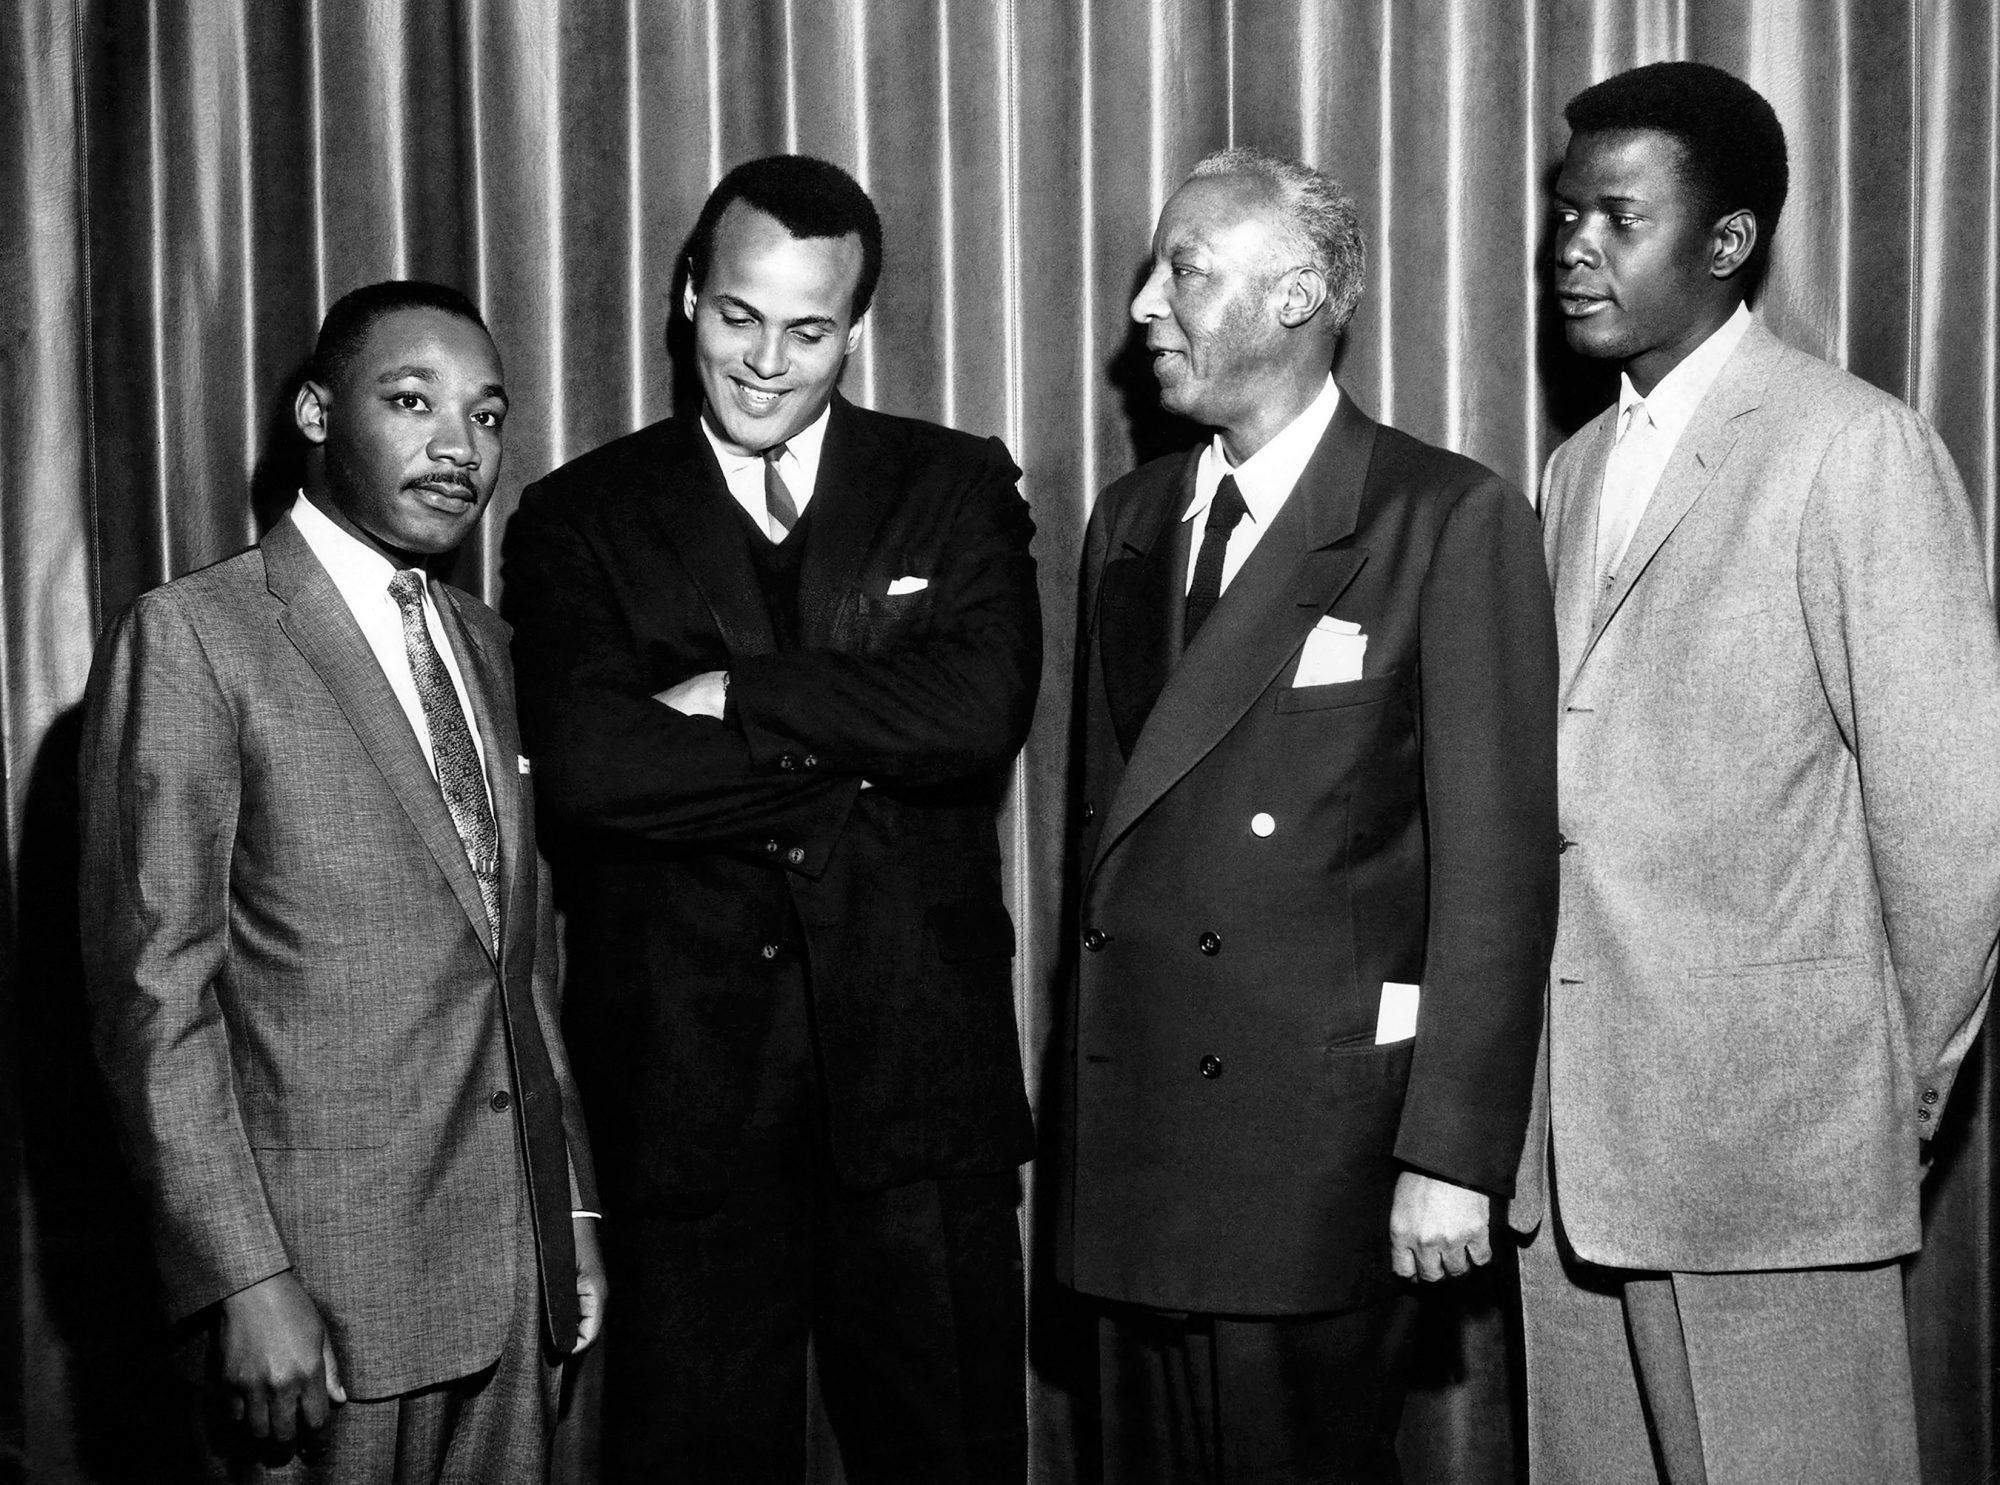 Martin Luther King Jr., Harry Belafonte, Sidney Poitier